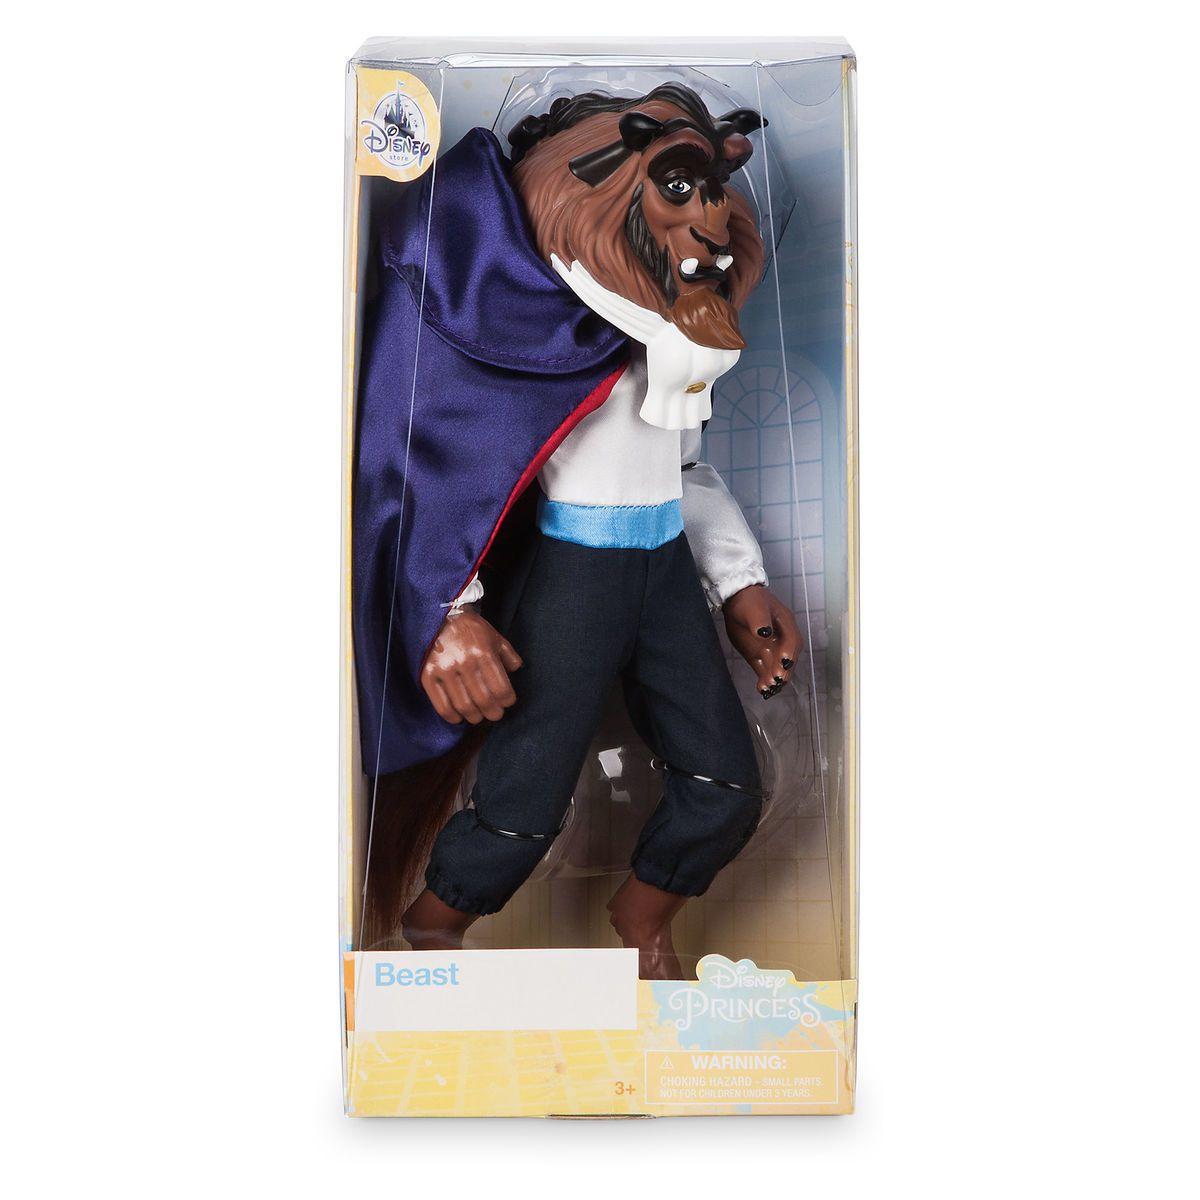 Boneco Fera - Classic Doll A Bela e a Fera Original Disney Store